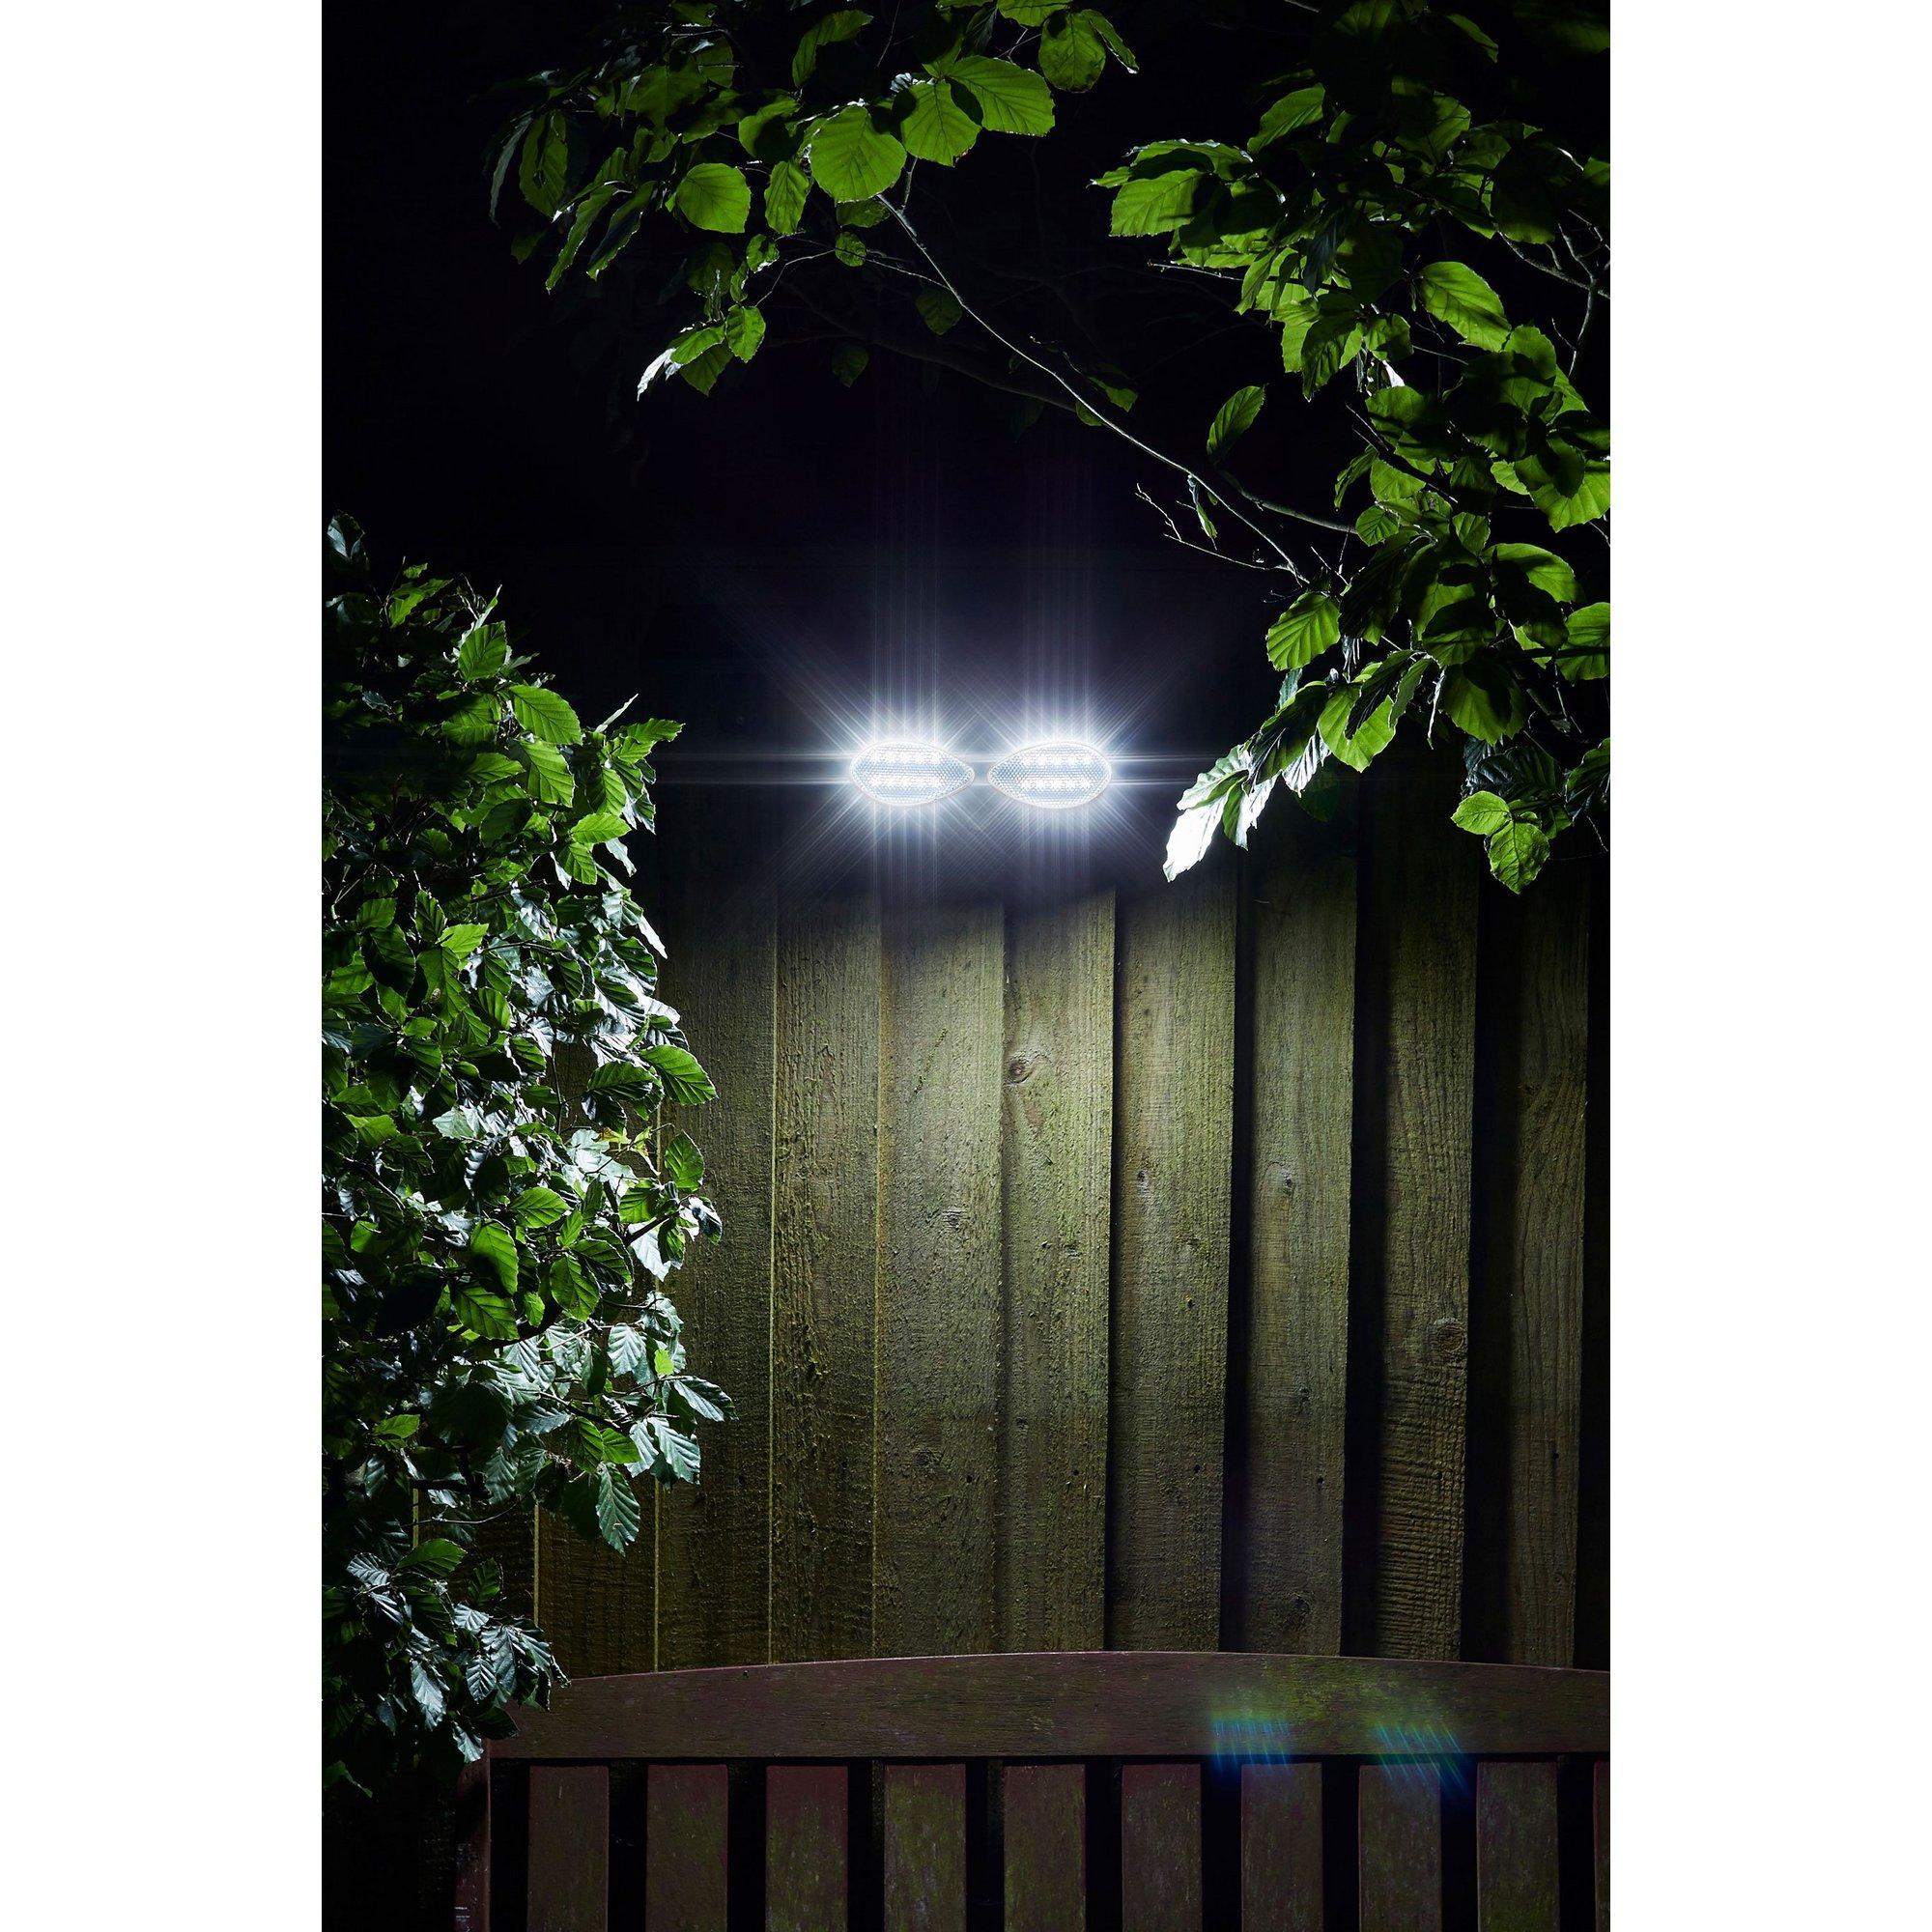 Image of PIR Security Light